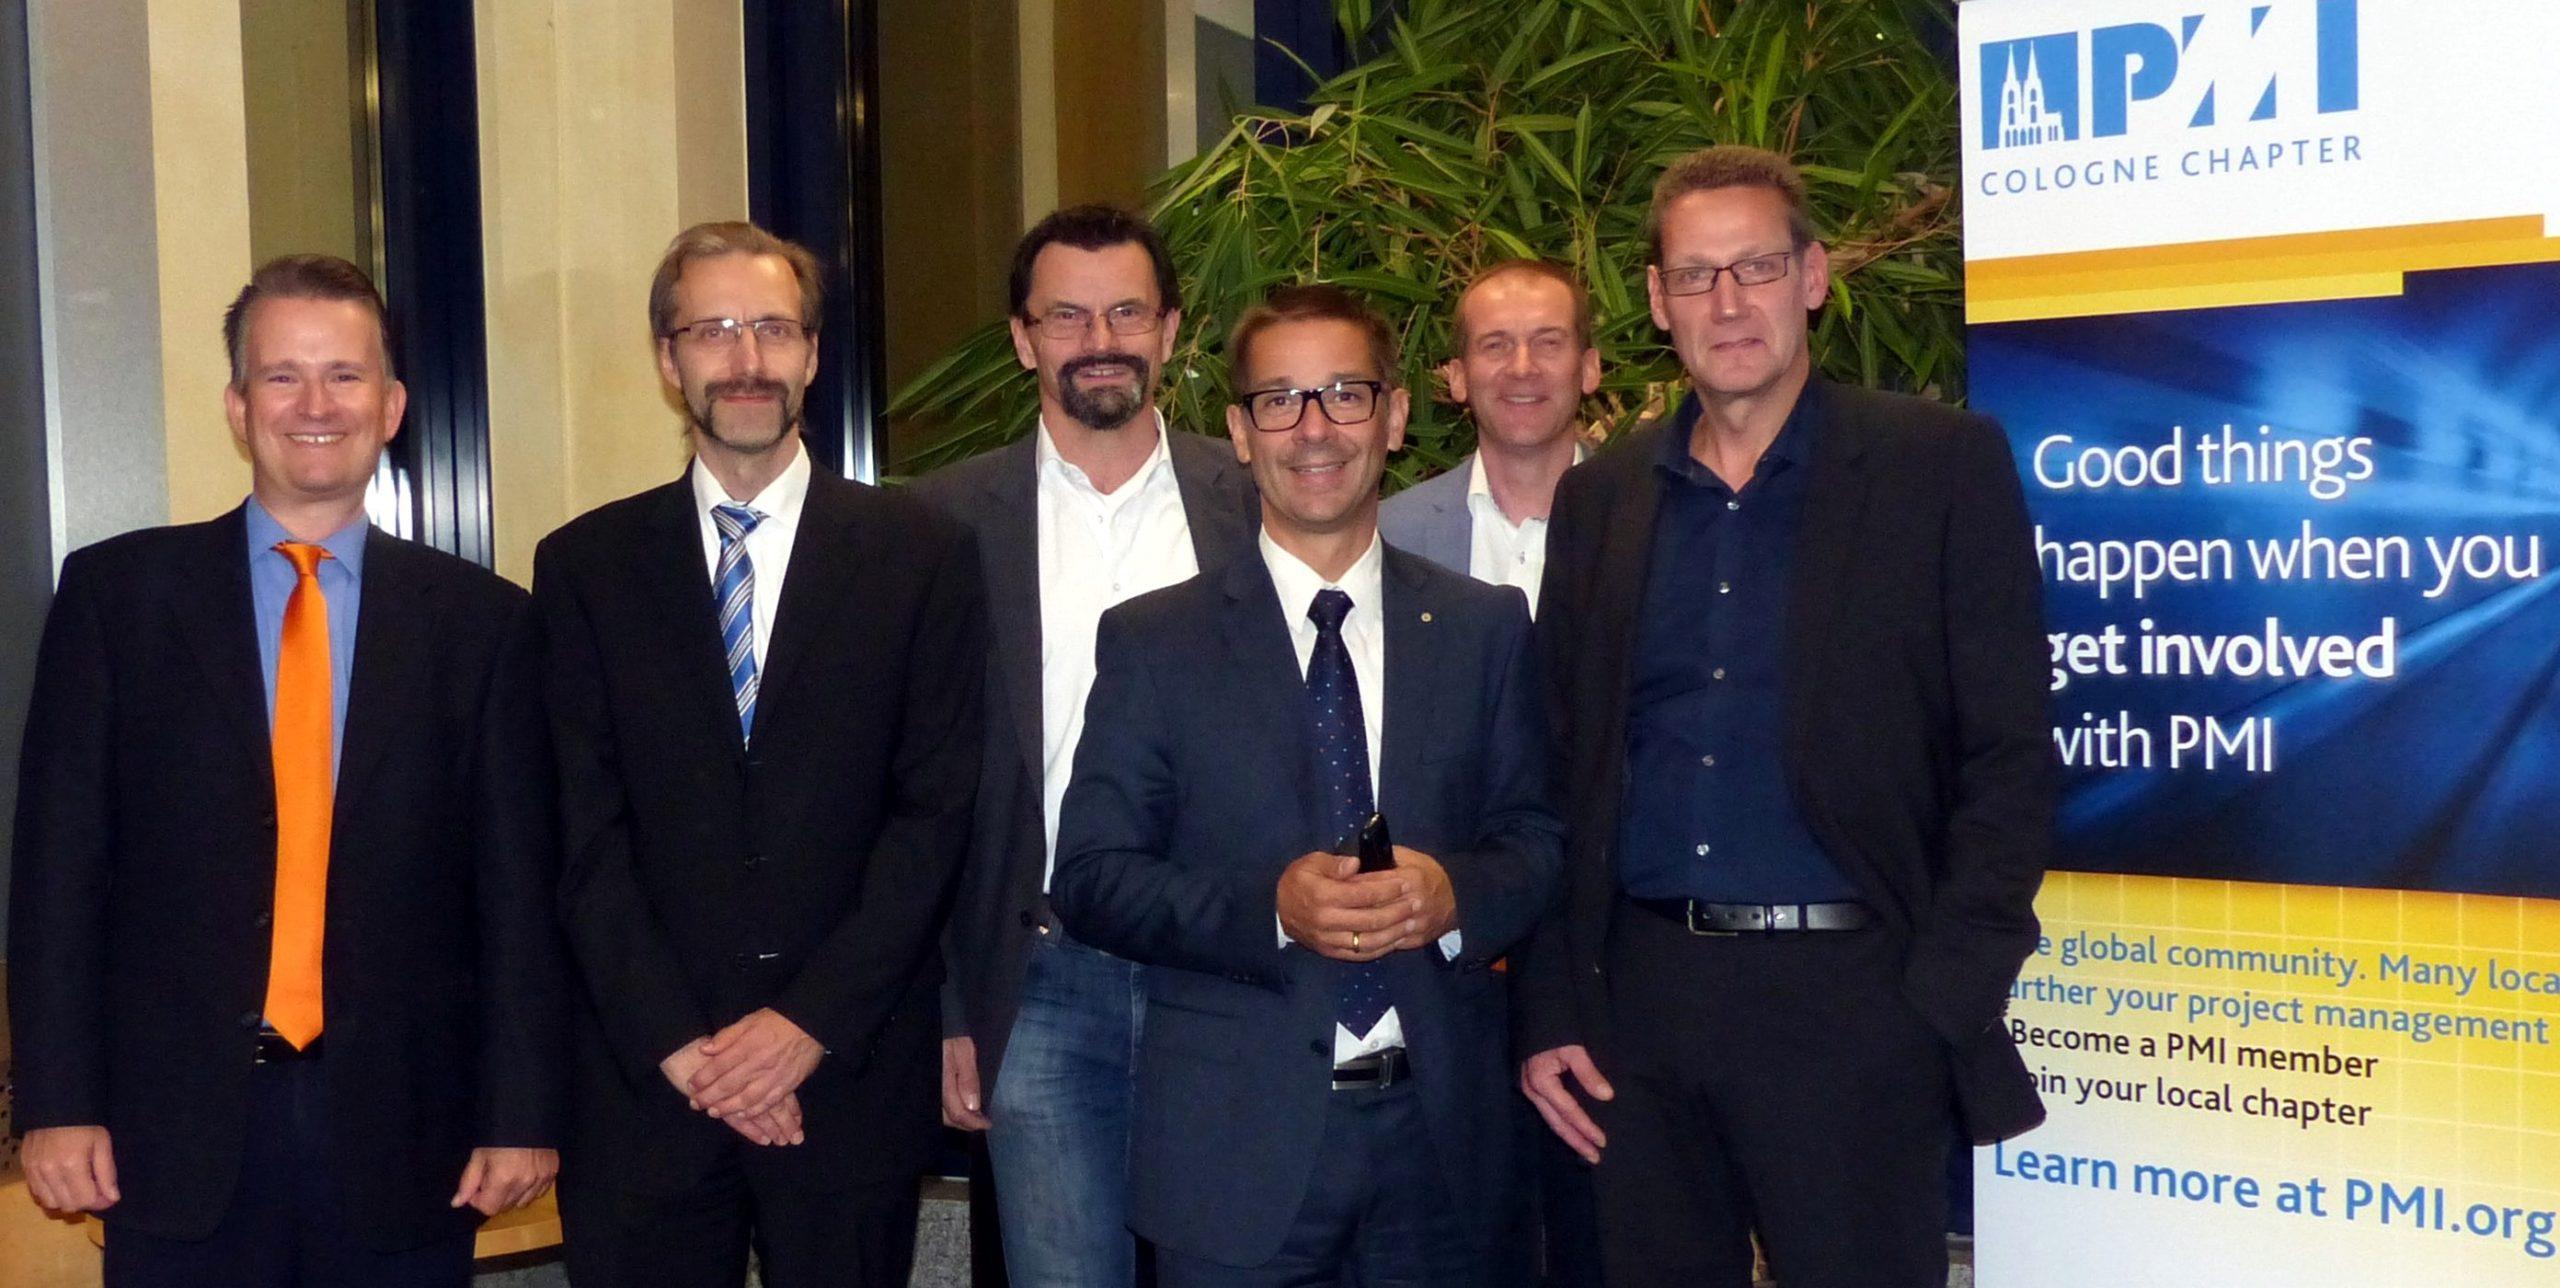 Rückblick Chaptermeeting vom 1. Okt. 2015 in Bonn Pützchen